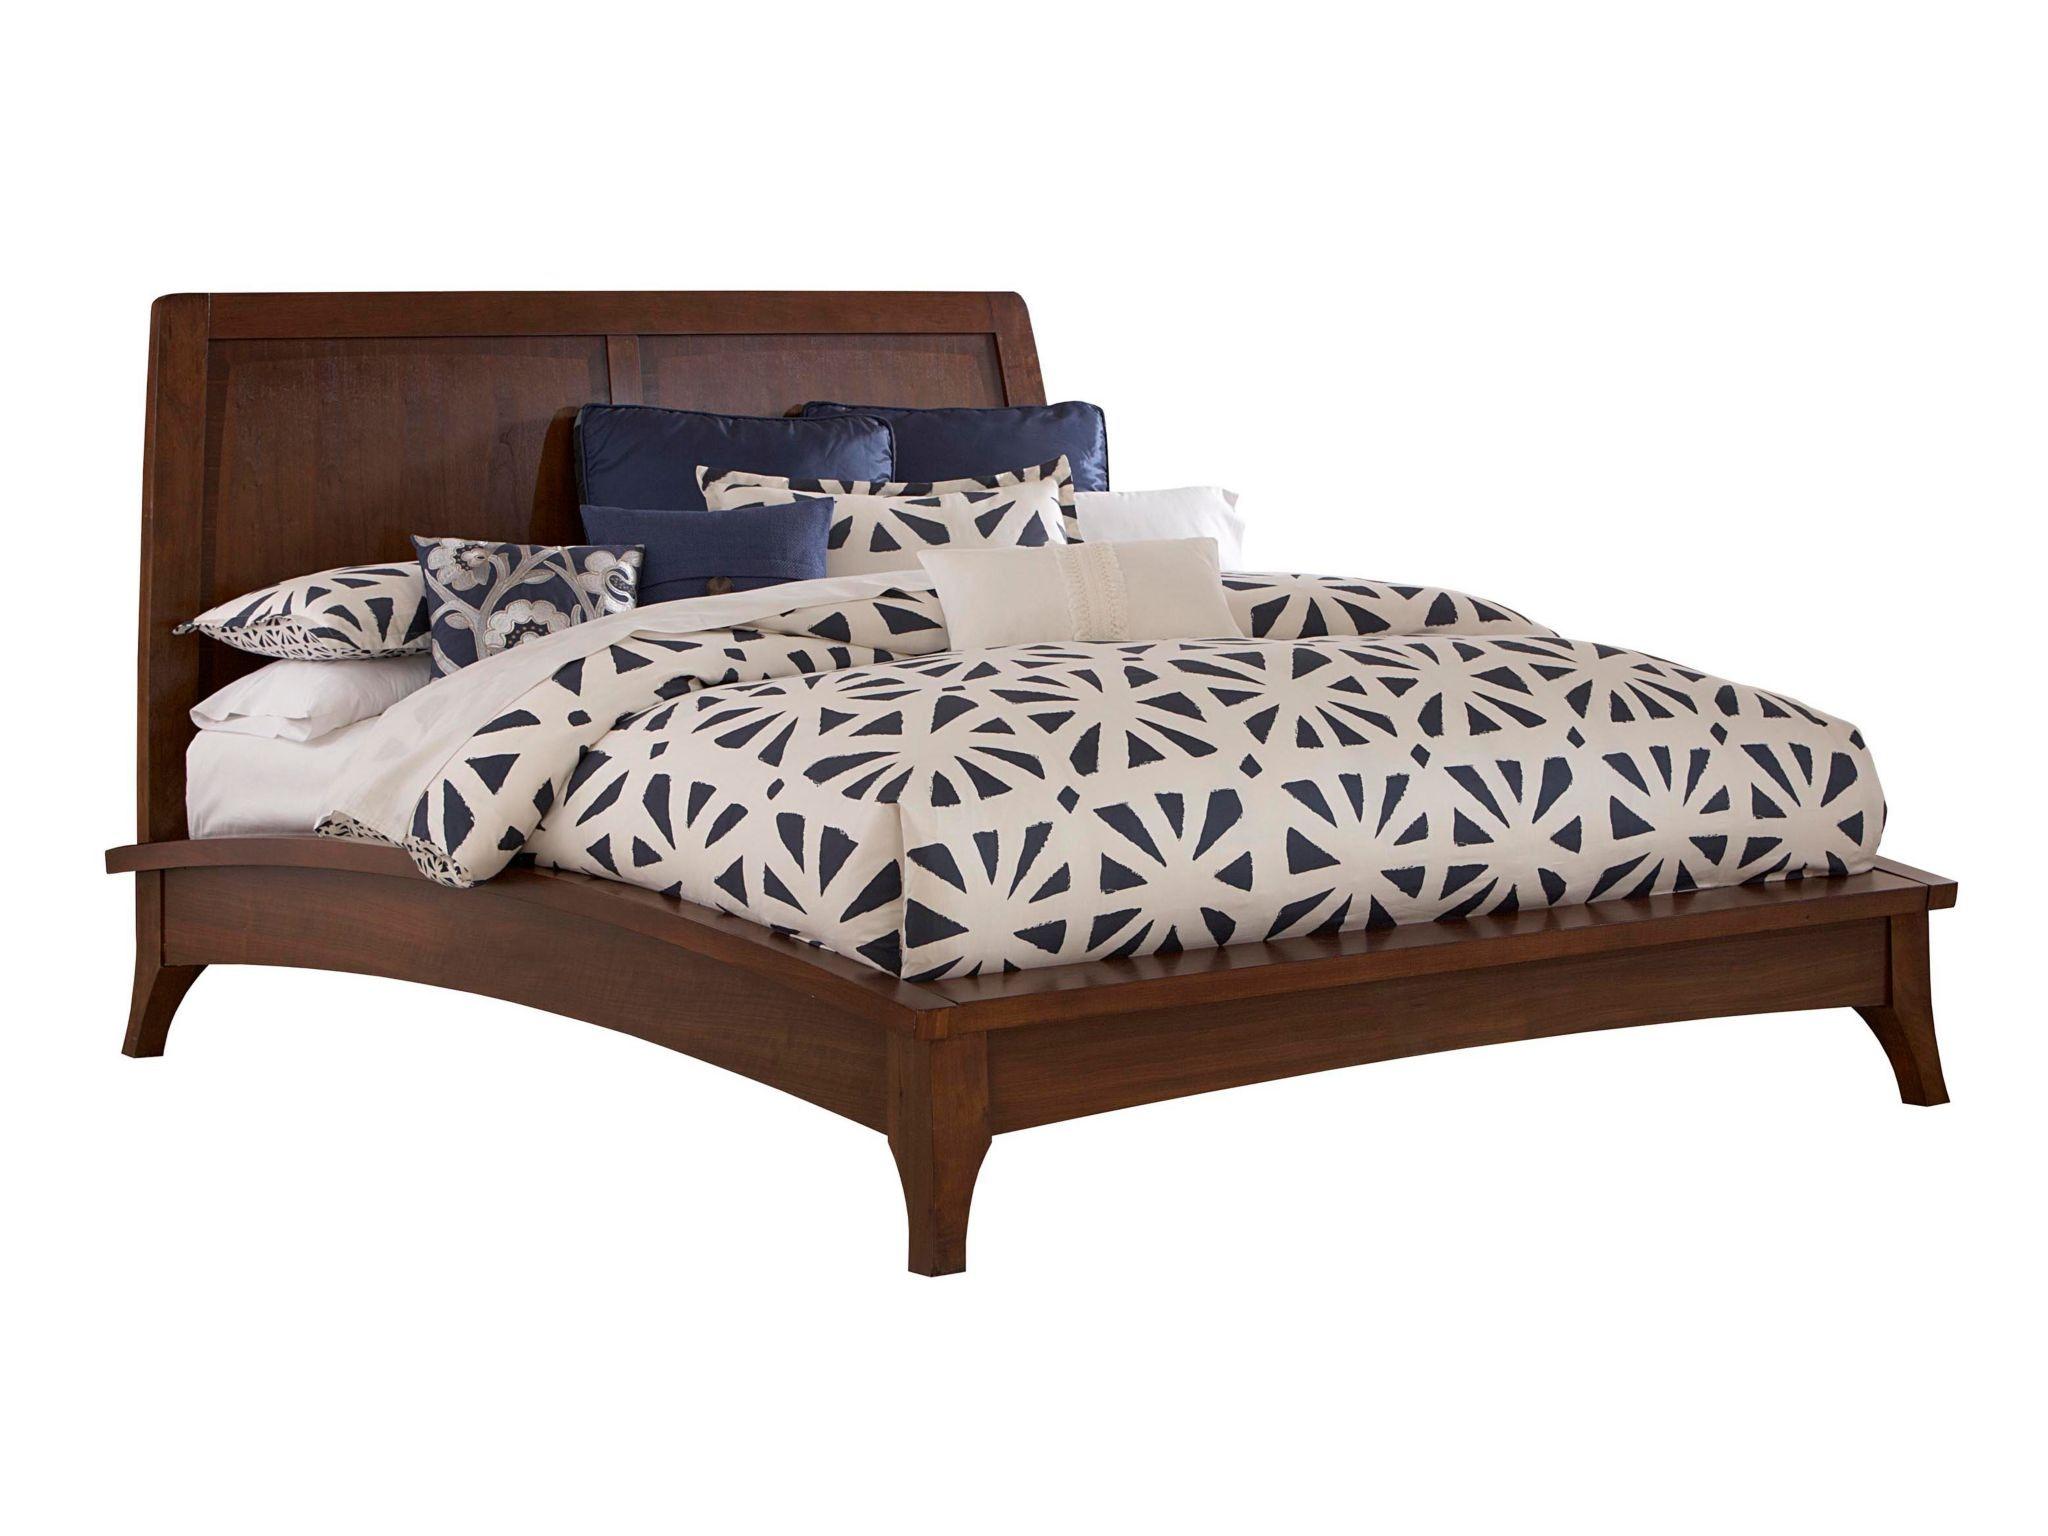 Broyhill Bedroom Mardella Bed 4277 BED Goldsteins